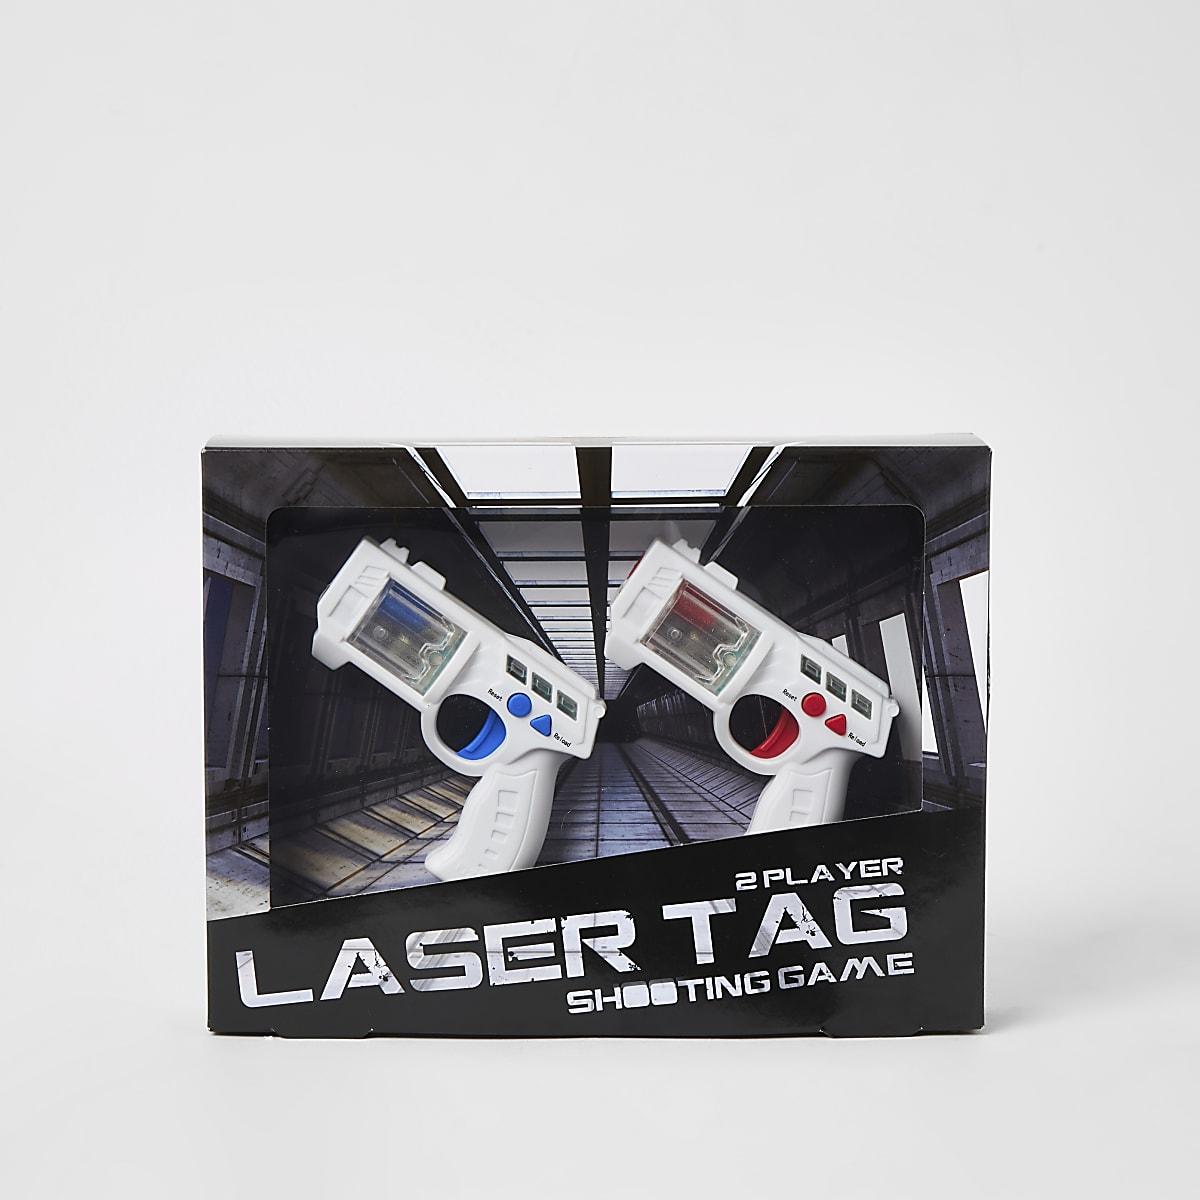 Laser tag 2 player shooting game